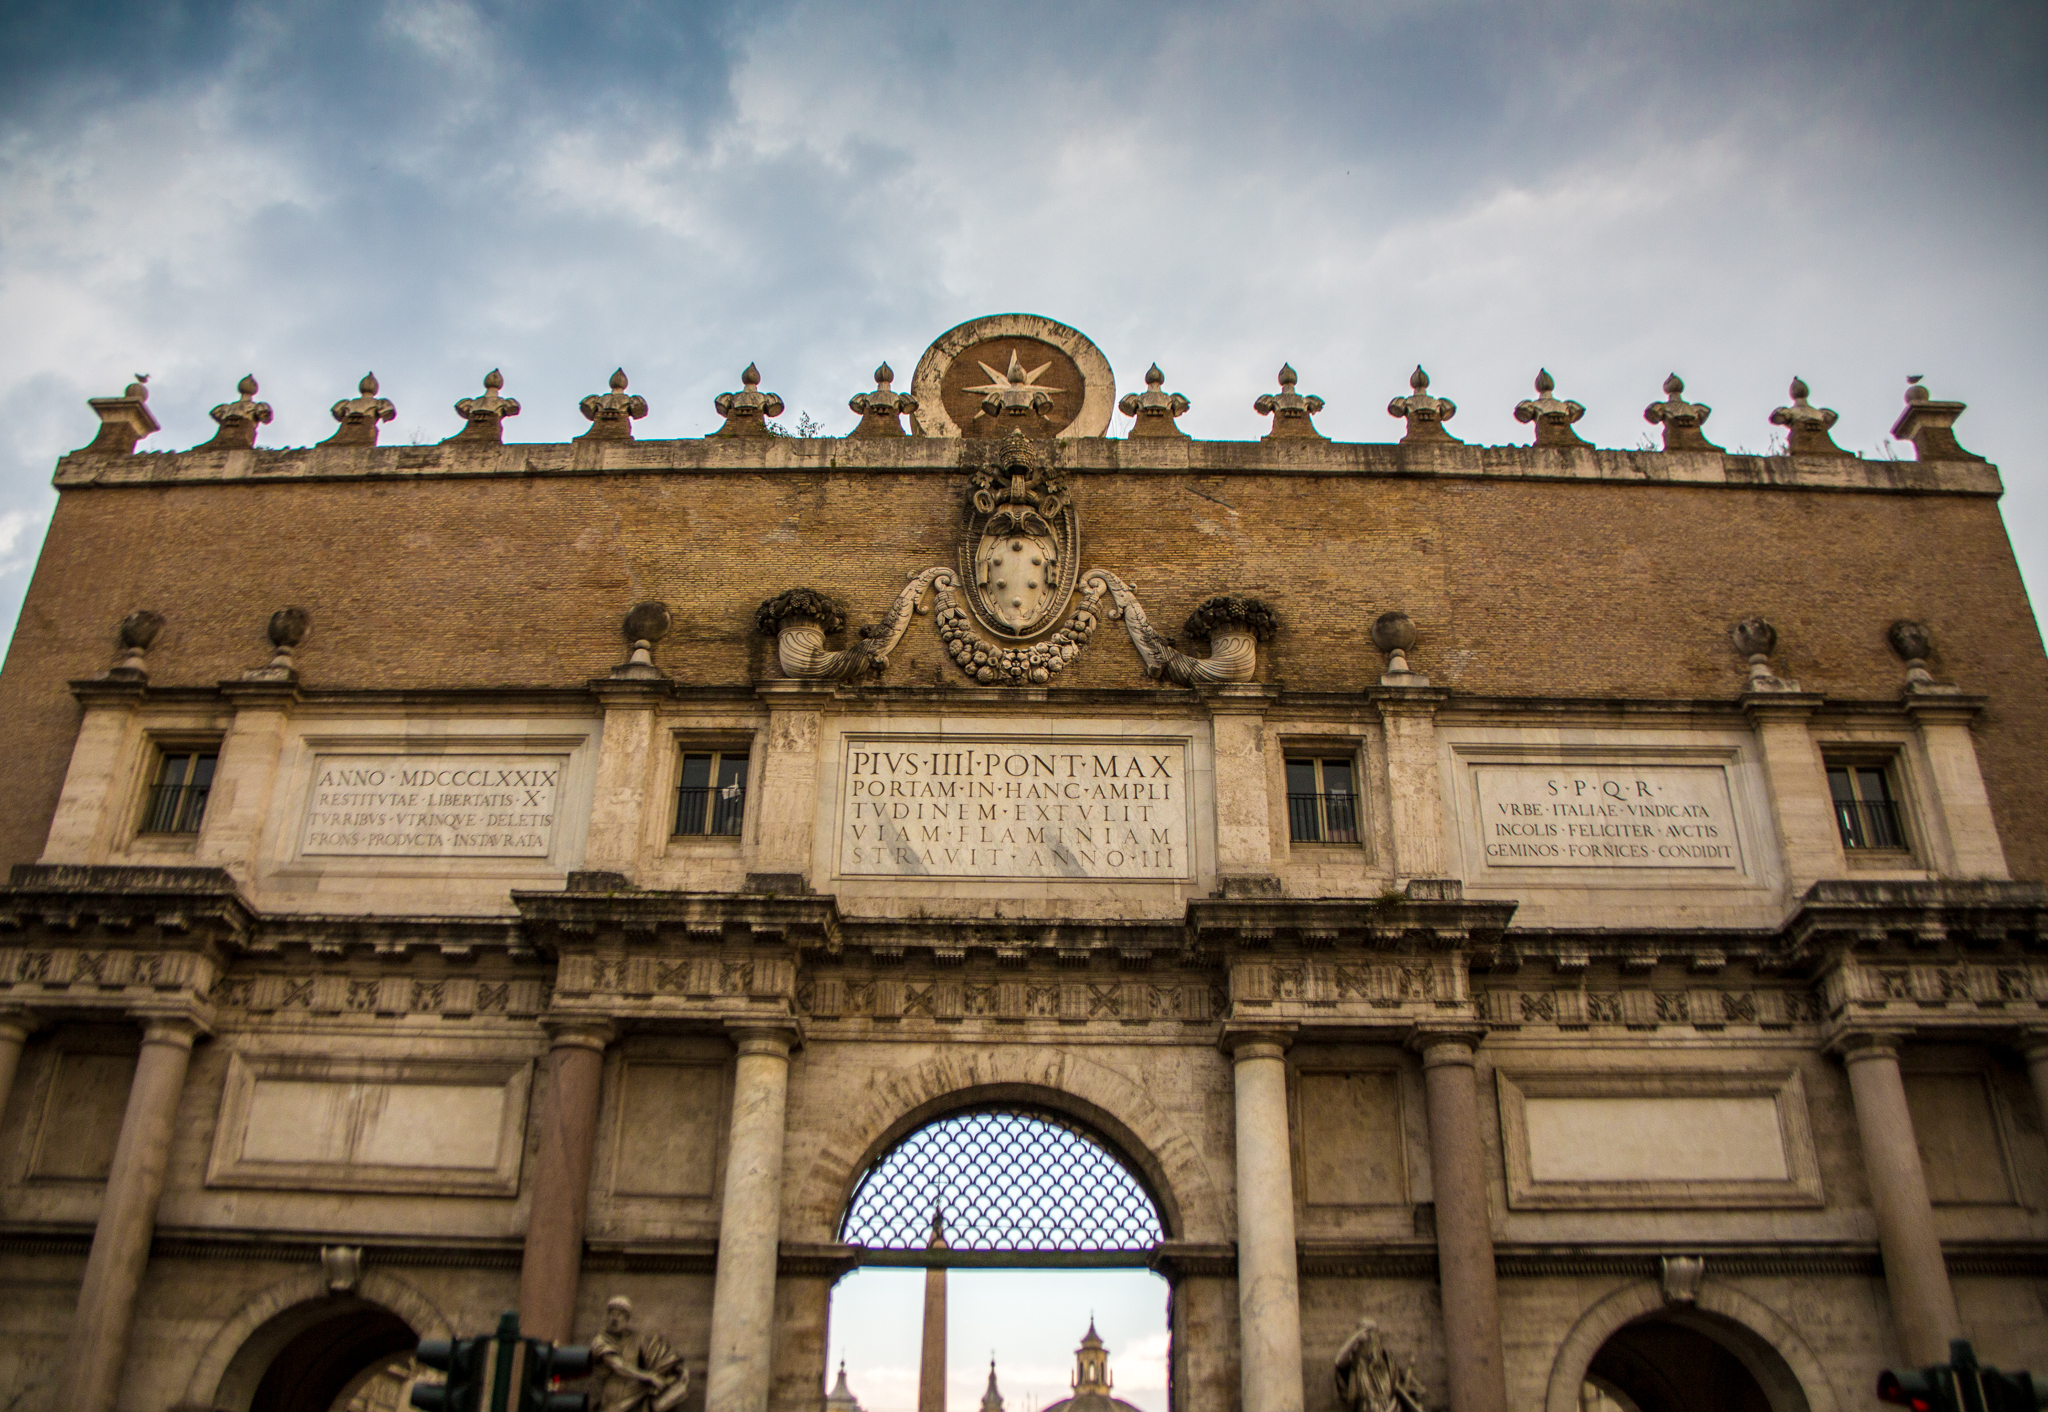 Entrance to Piazza Del Popolo